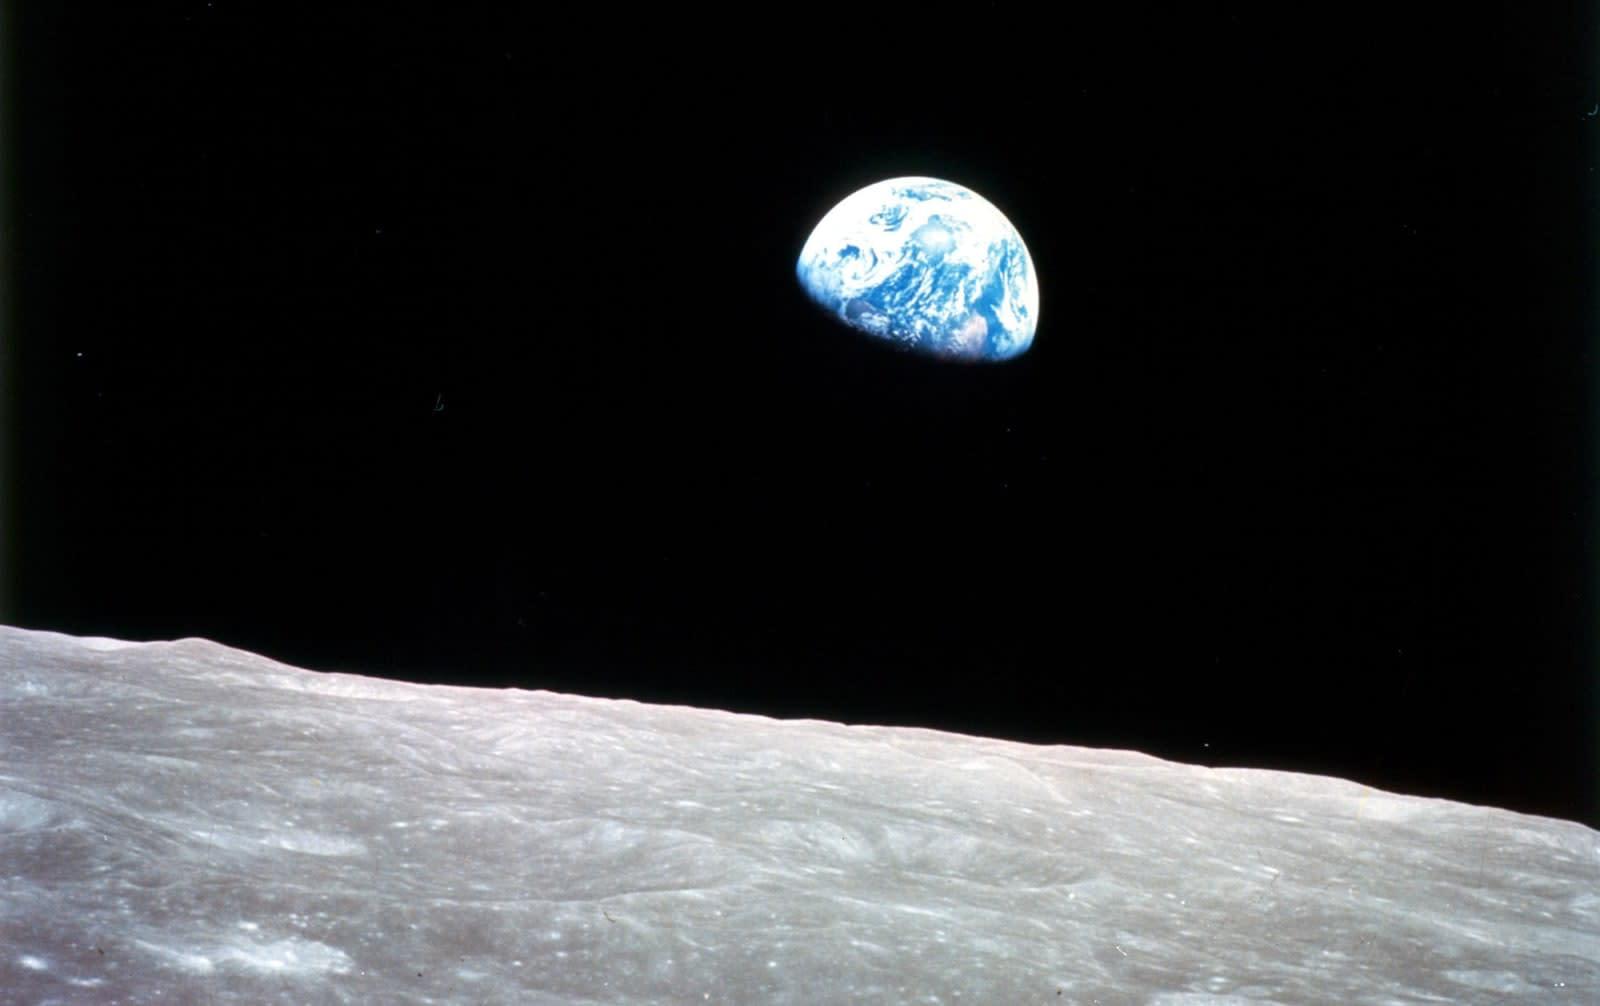 NASA/Corbis/Getty Images